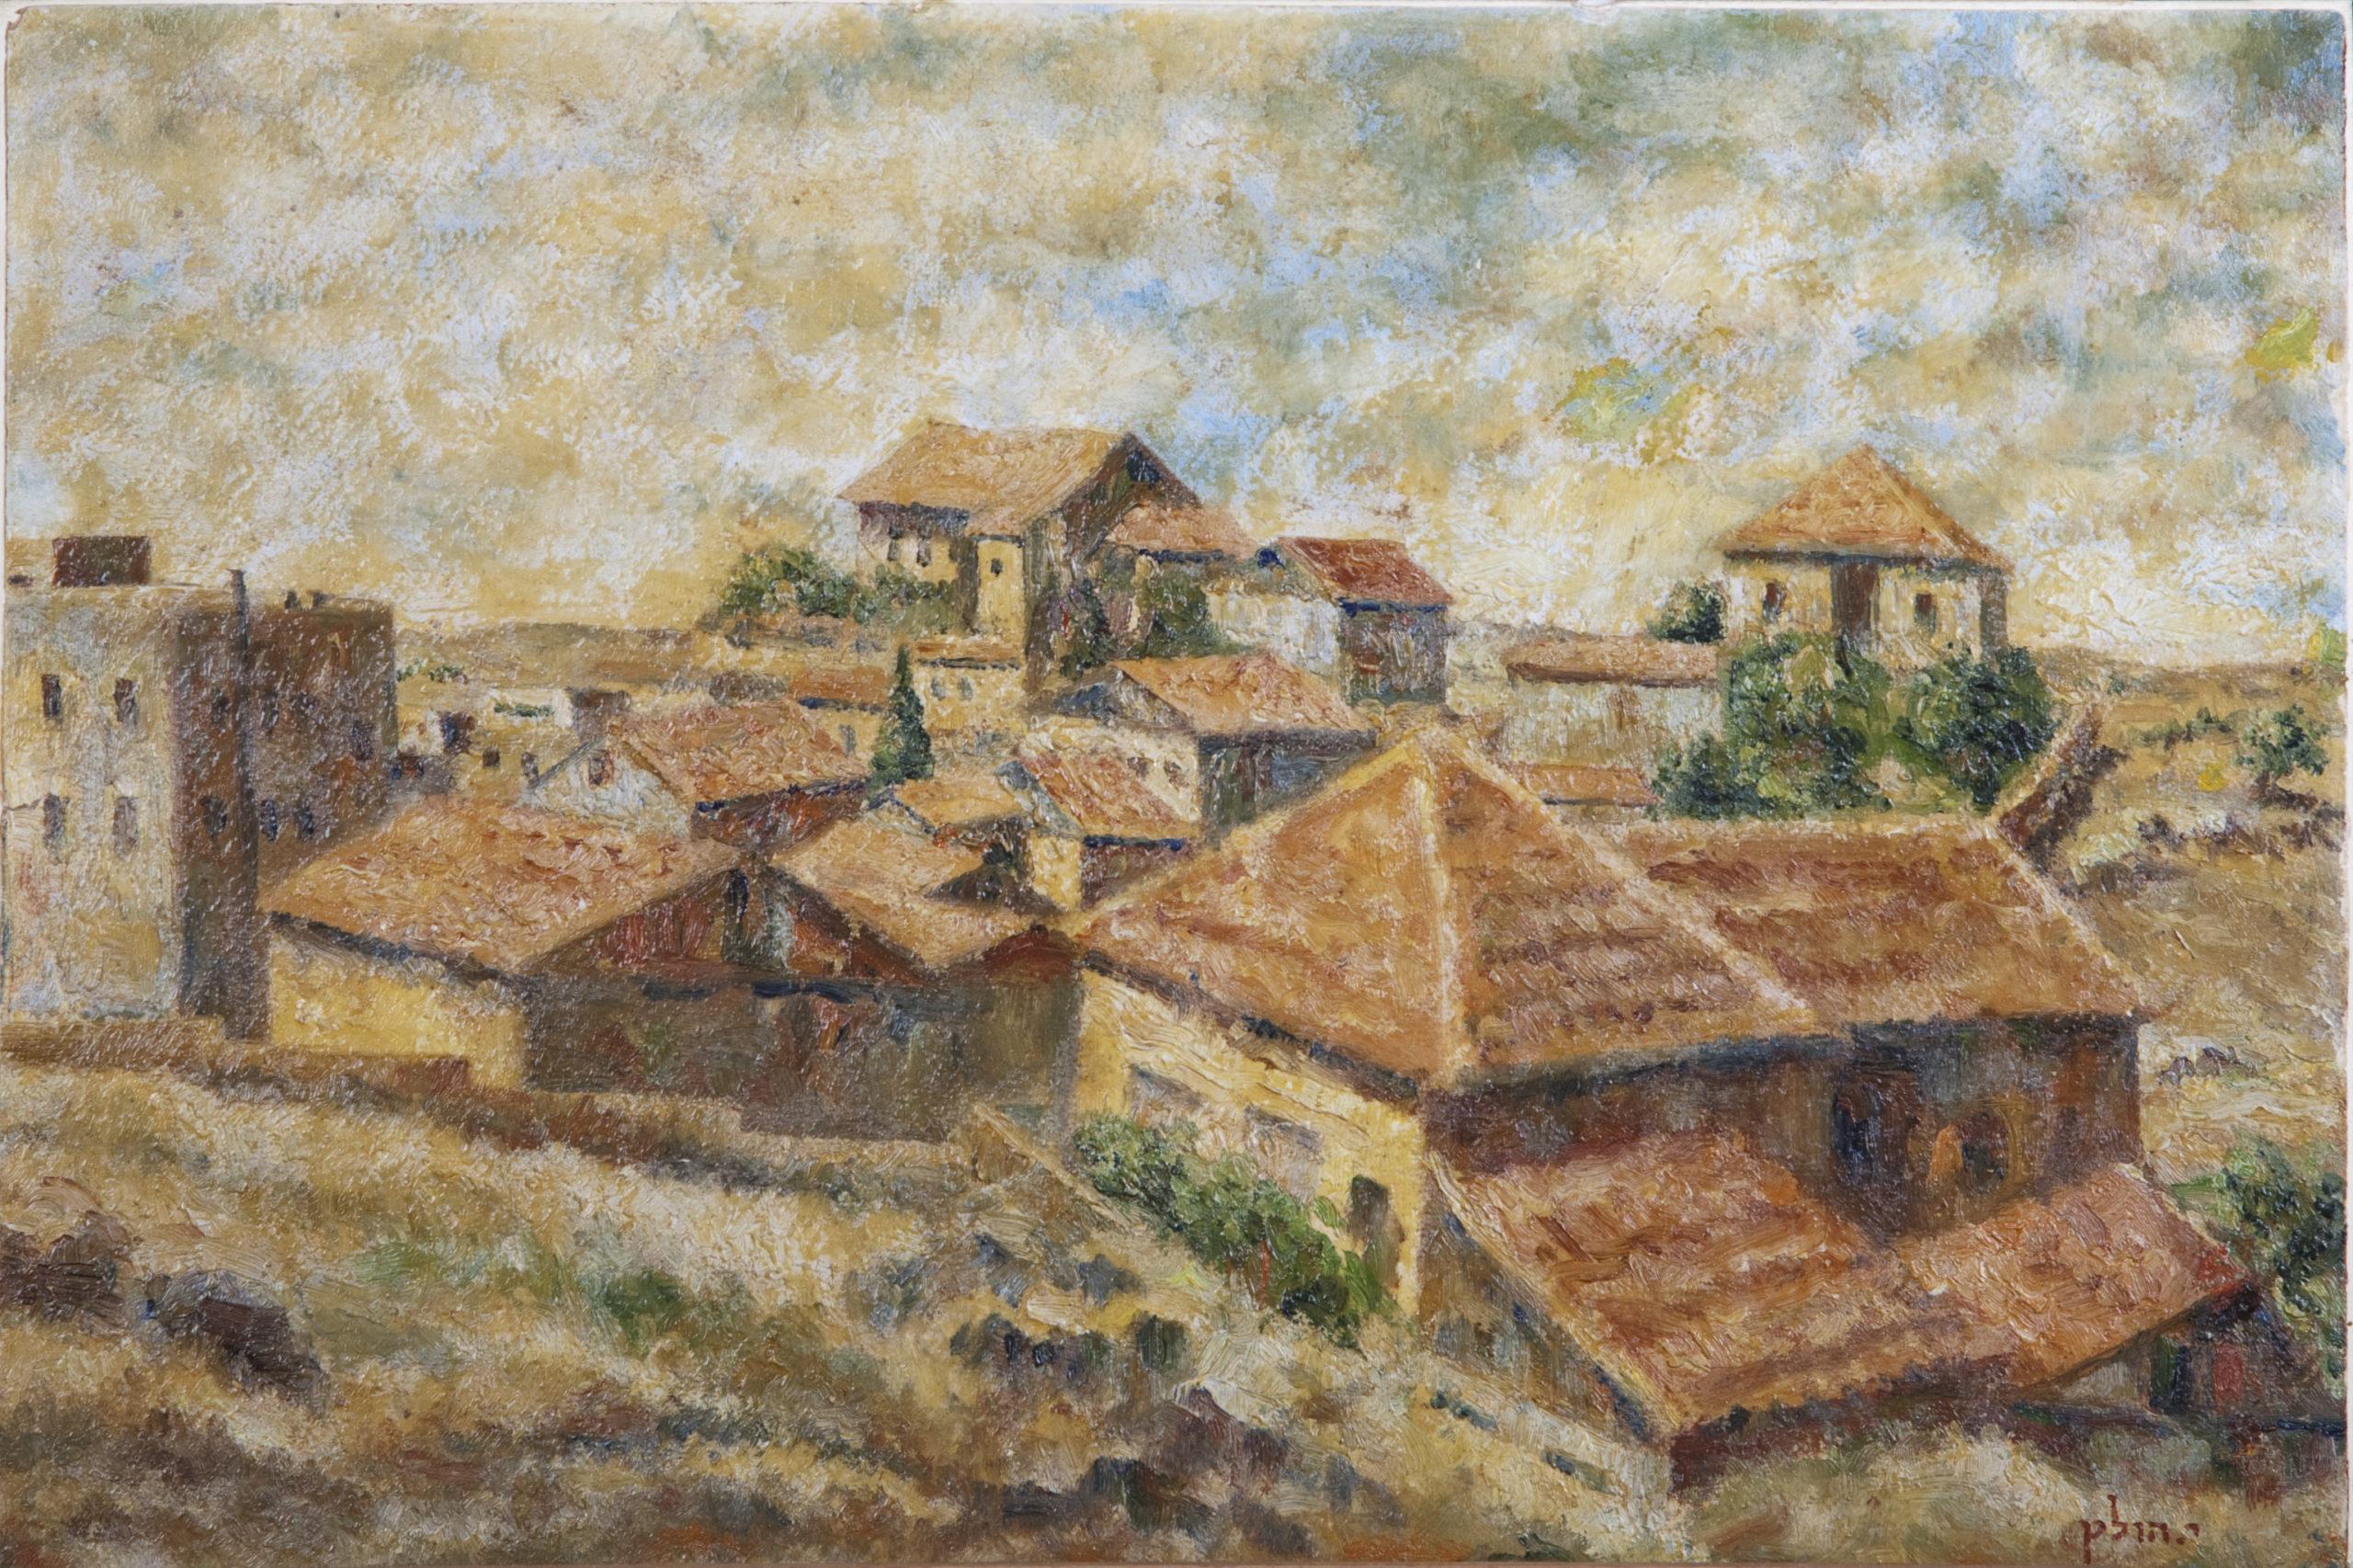 047 Tel Arza 1947 - Oil on Paper - 17.5 x 11.75 - No Frame